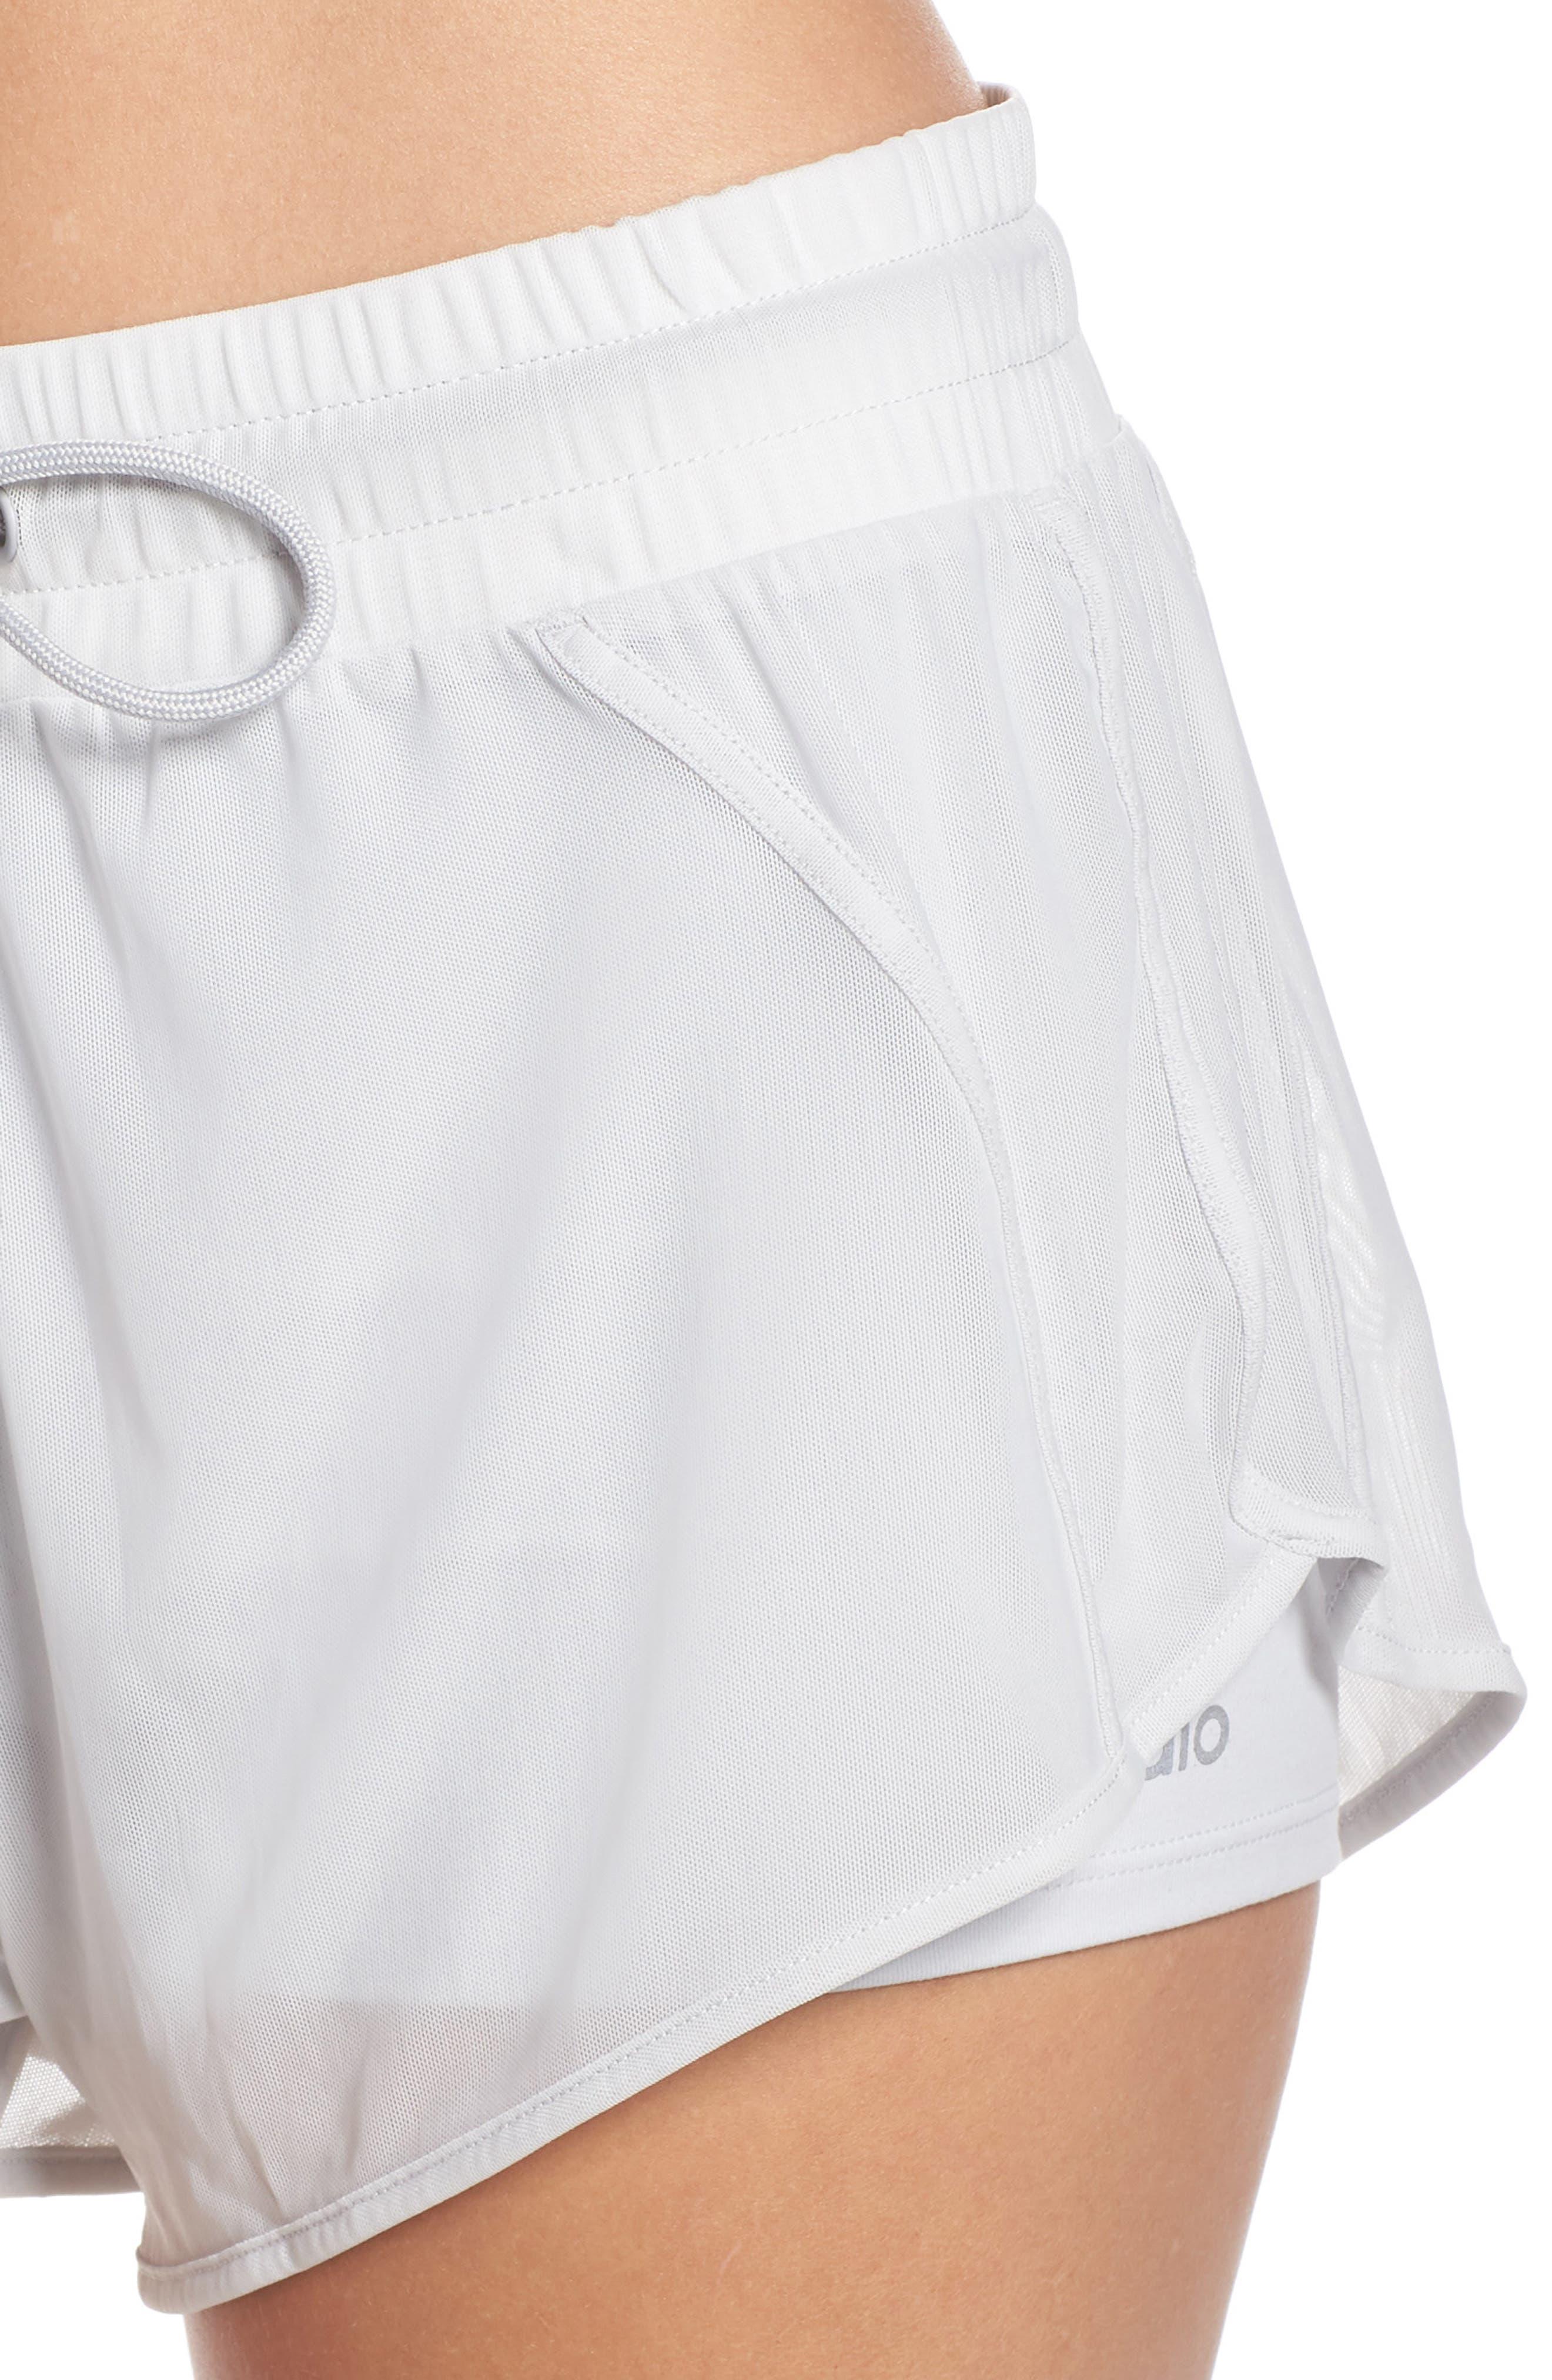 ALO,                             Ambience Shorts,                             Alternate thumbnail 4, color,                             020